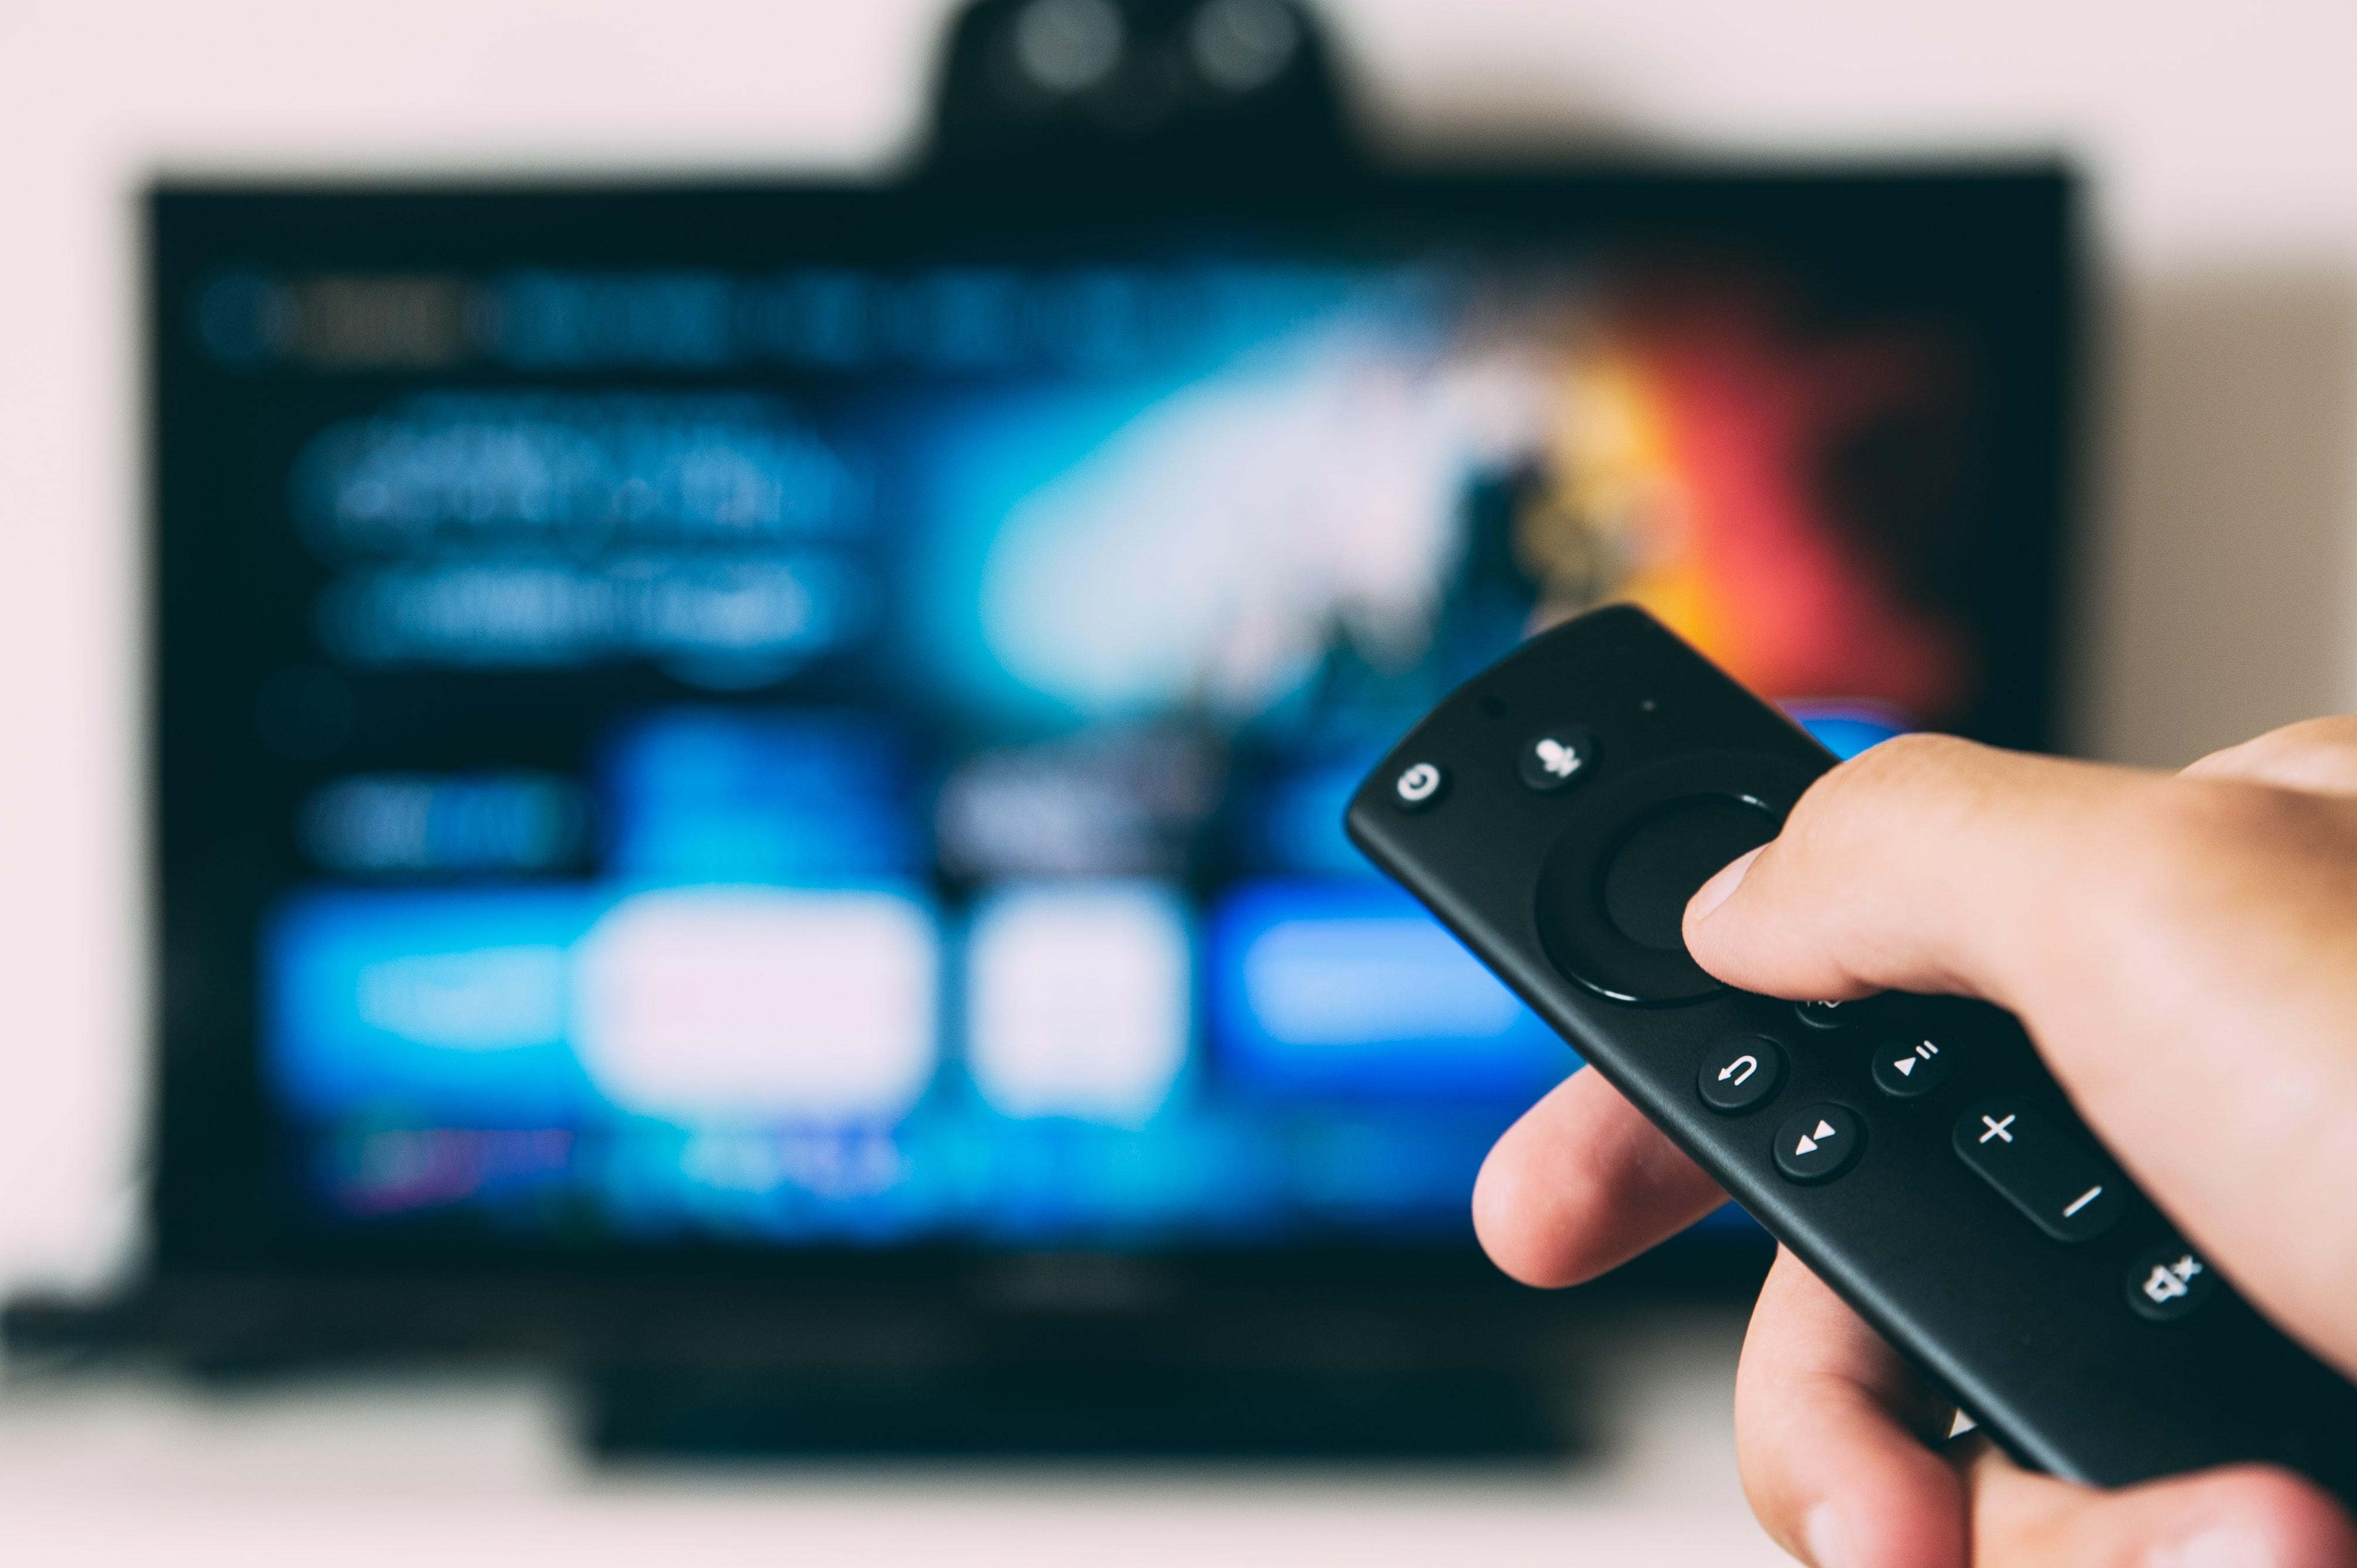 Interoperability To Data Liquidity: The Blockbuster to Netflix Analogy